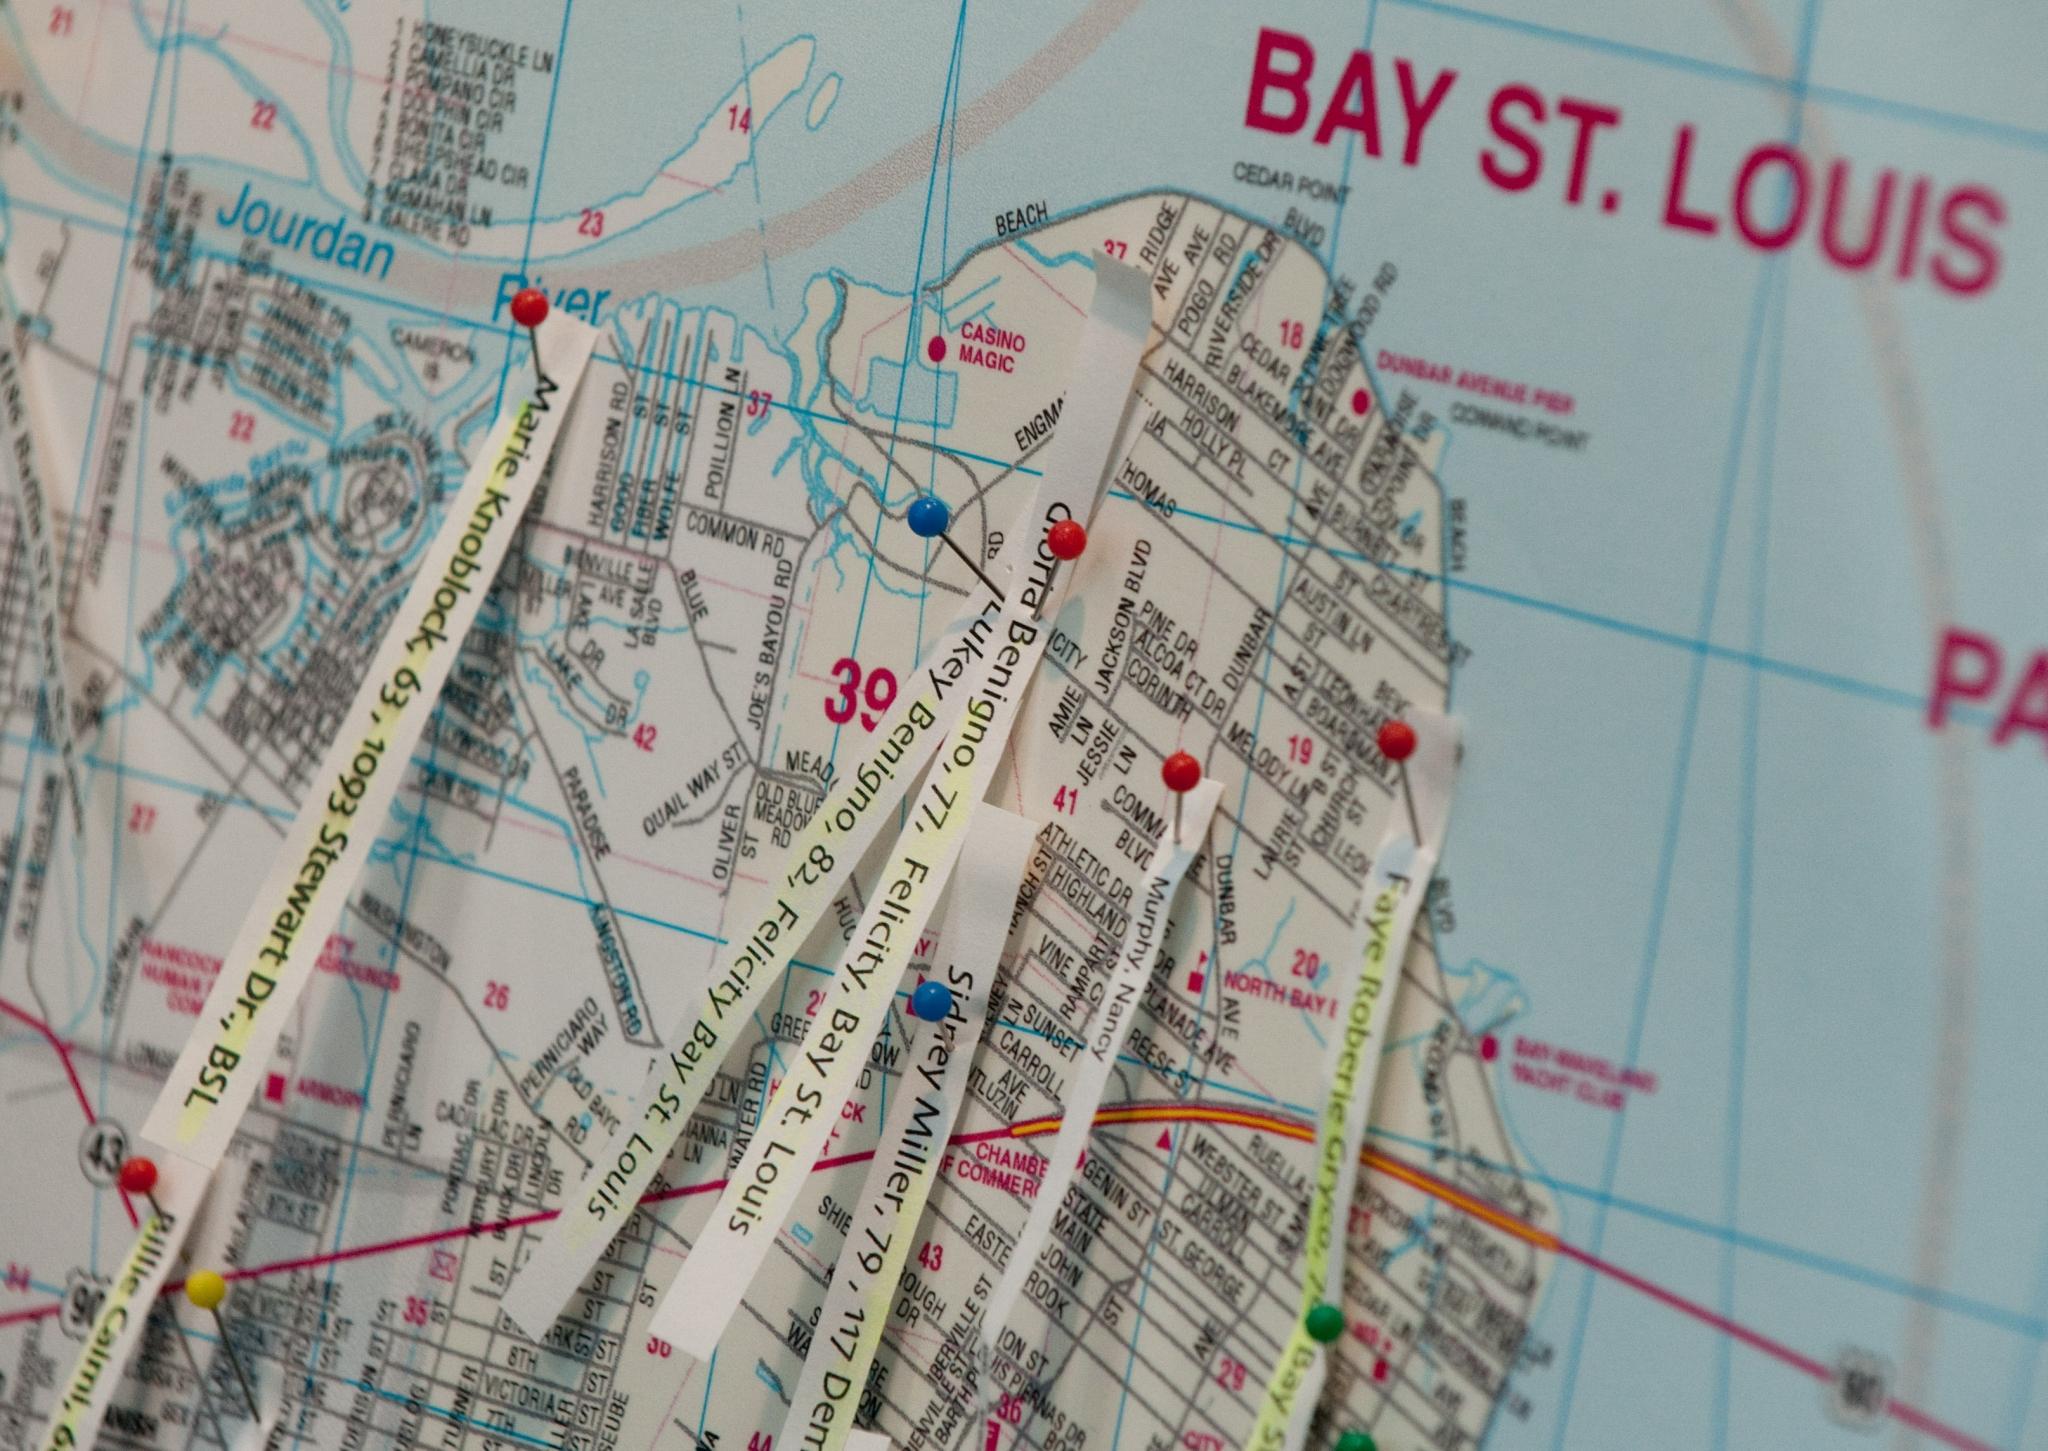 16 maps and charts that show Hurricane Katrina's deadly impact - Houston Chronicle